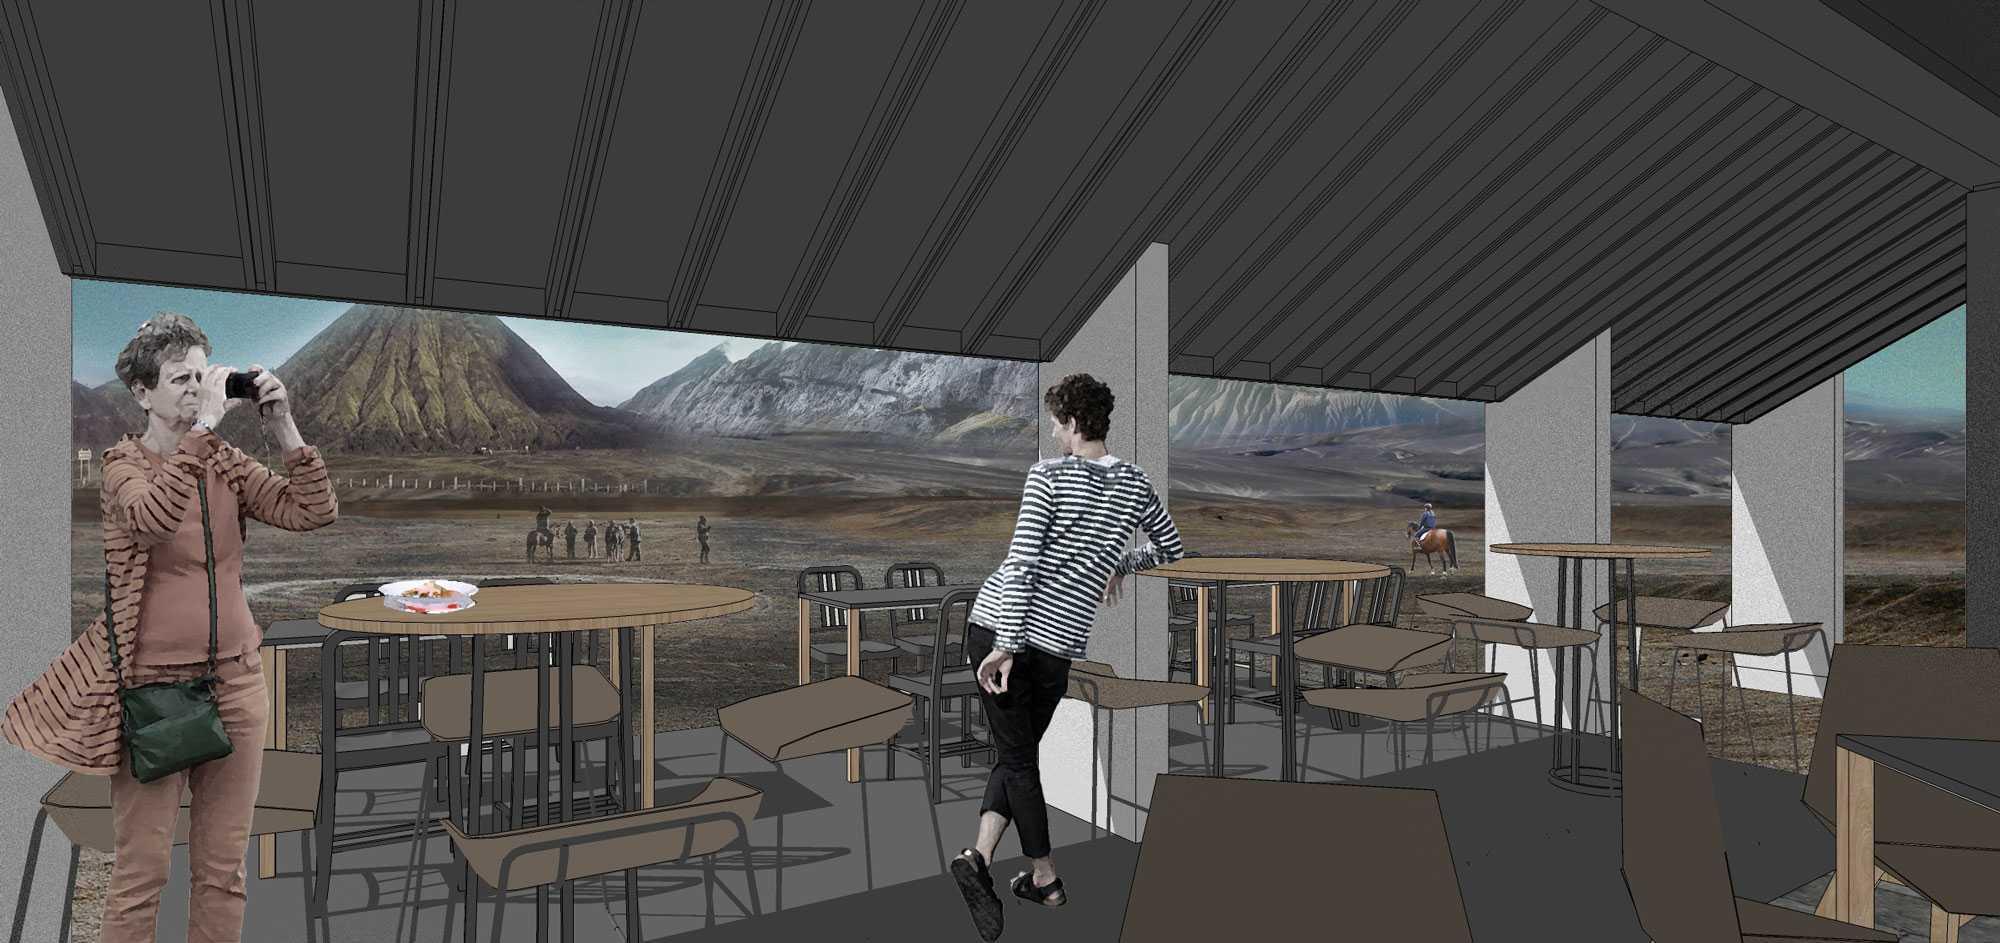 Fabdesain B_Restaurant Gn. Bromo, Podokoyo, Tosari, Pasuruan, Jawa Timur, Indonesia Gn. Bromo, Podokoyo, Tosari, Pasuruan, Jawa Timur, Indonesia Seating Area Restaurant Contemporary  40519